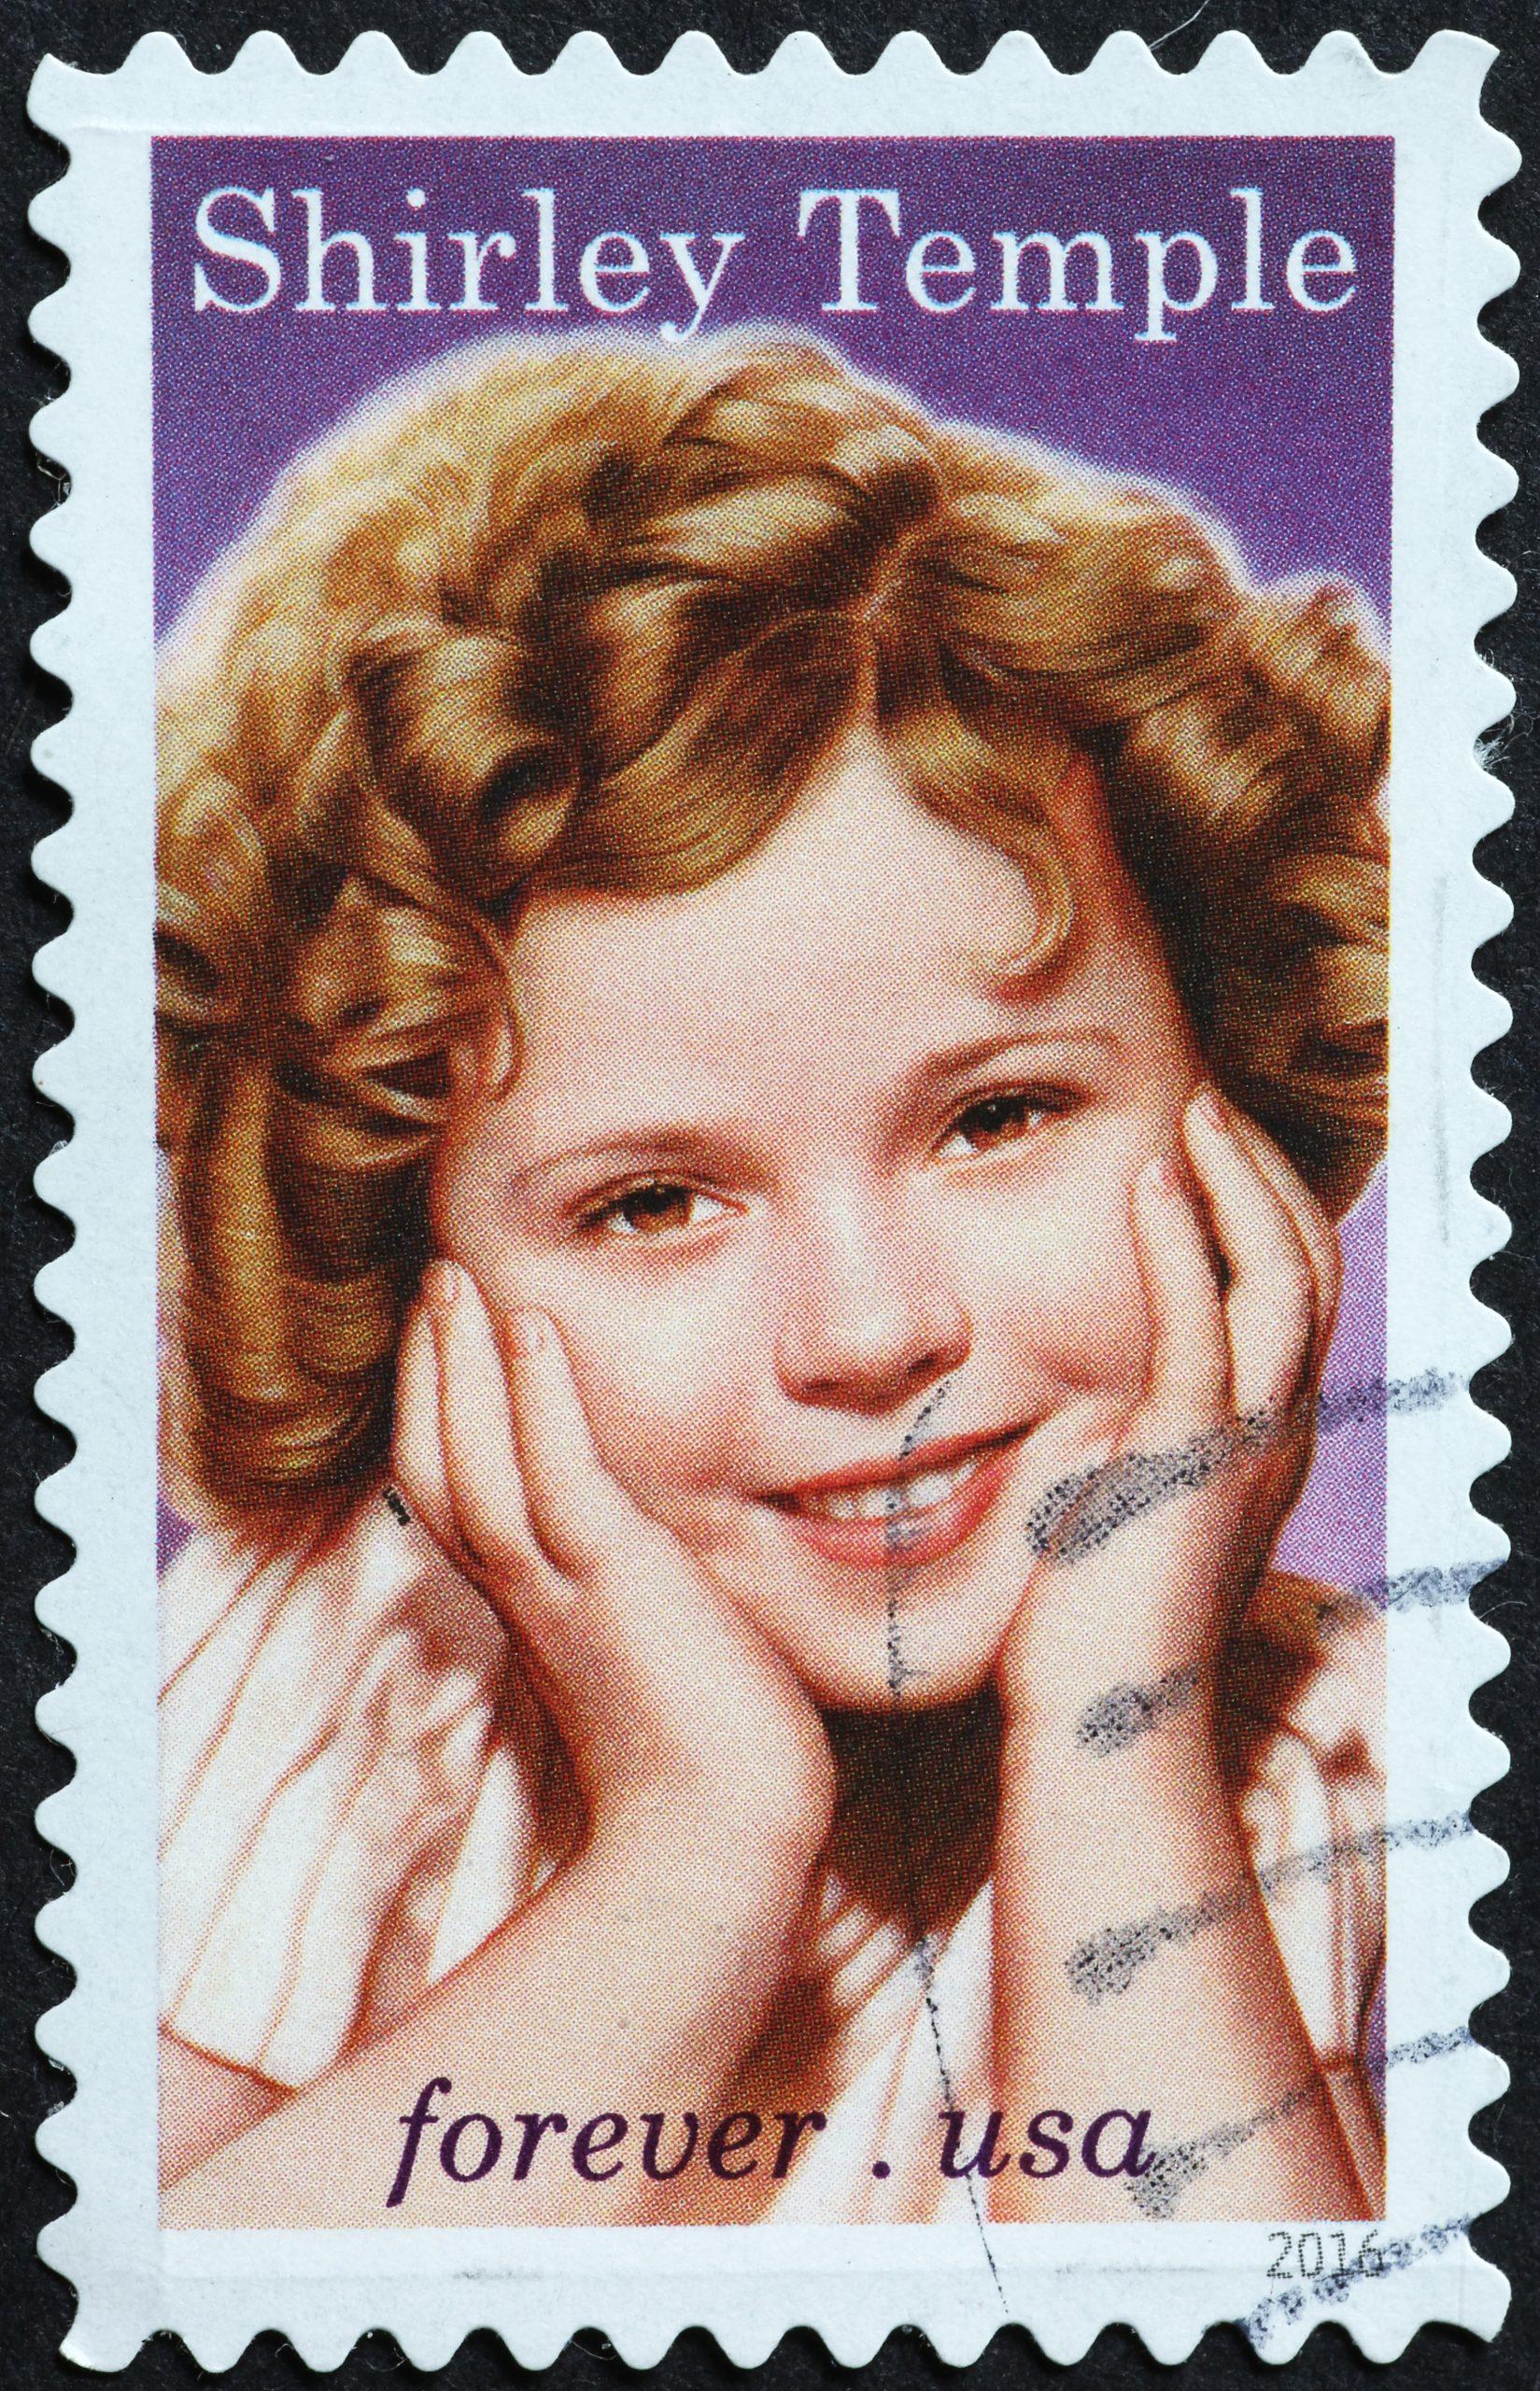 Shirley Temple herself